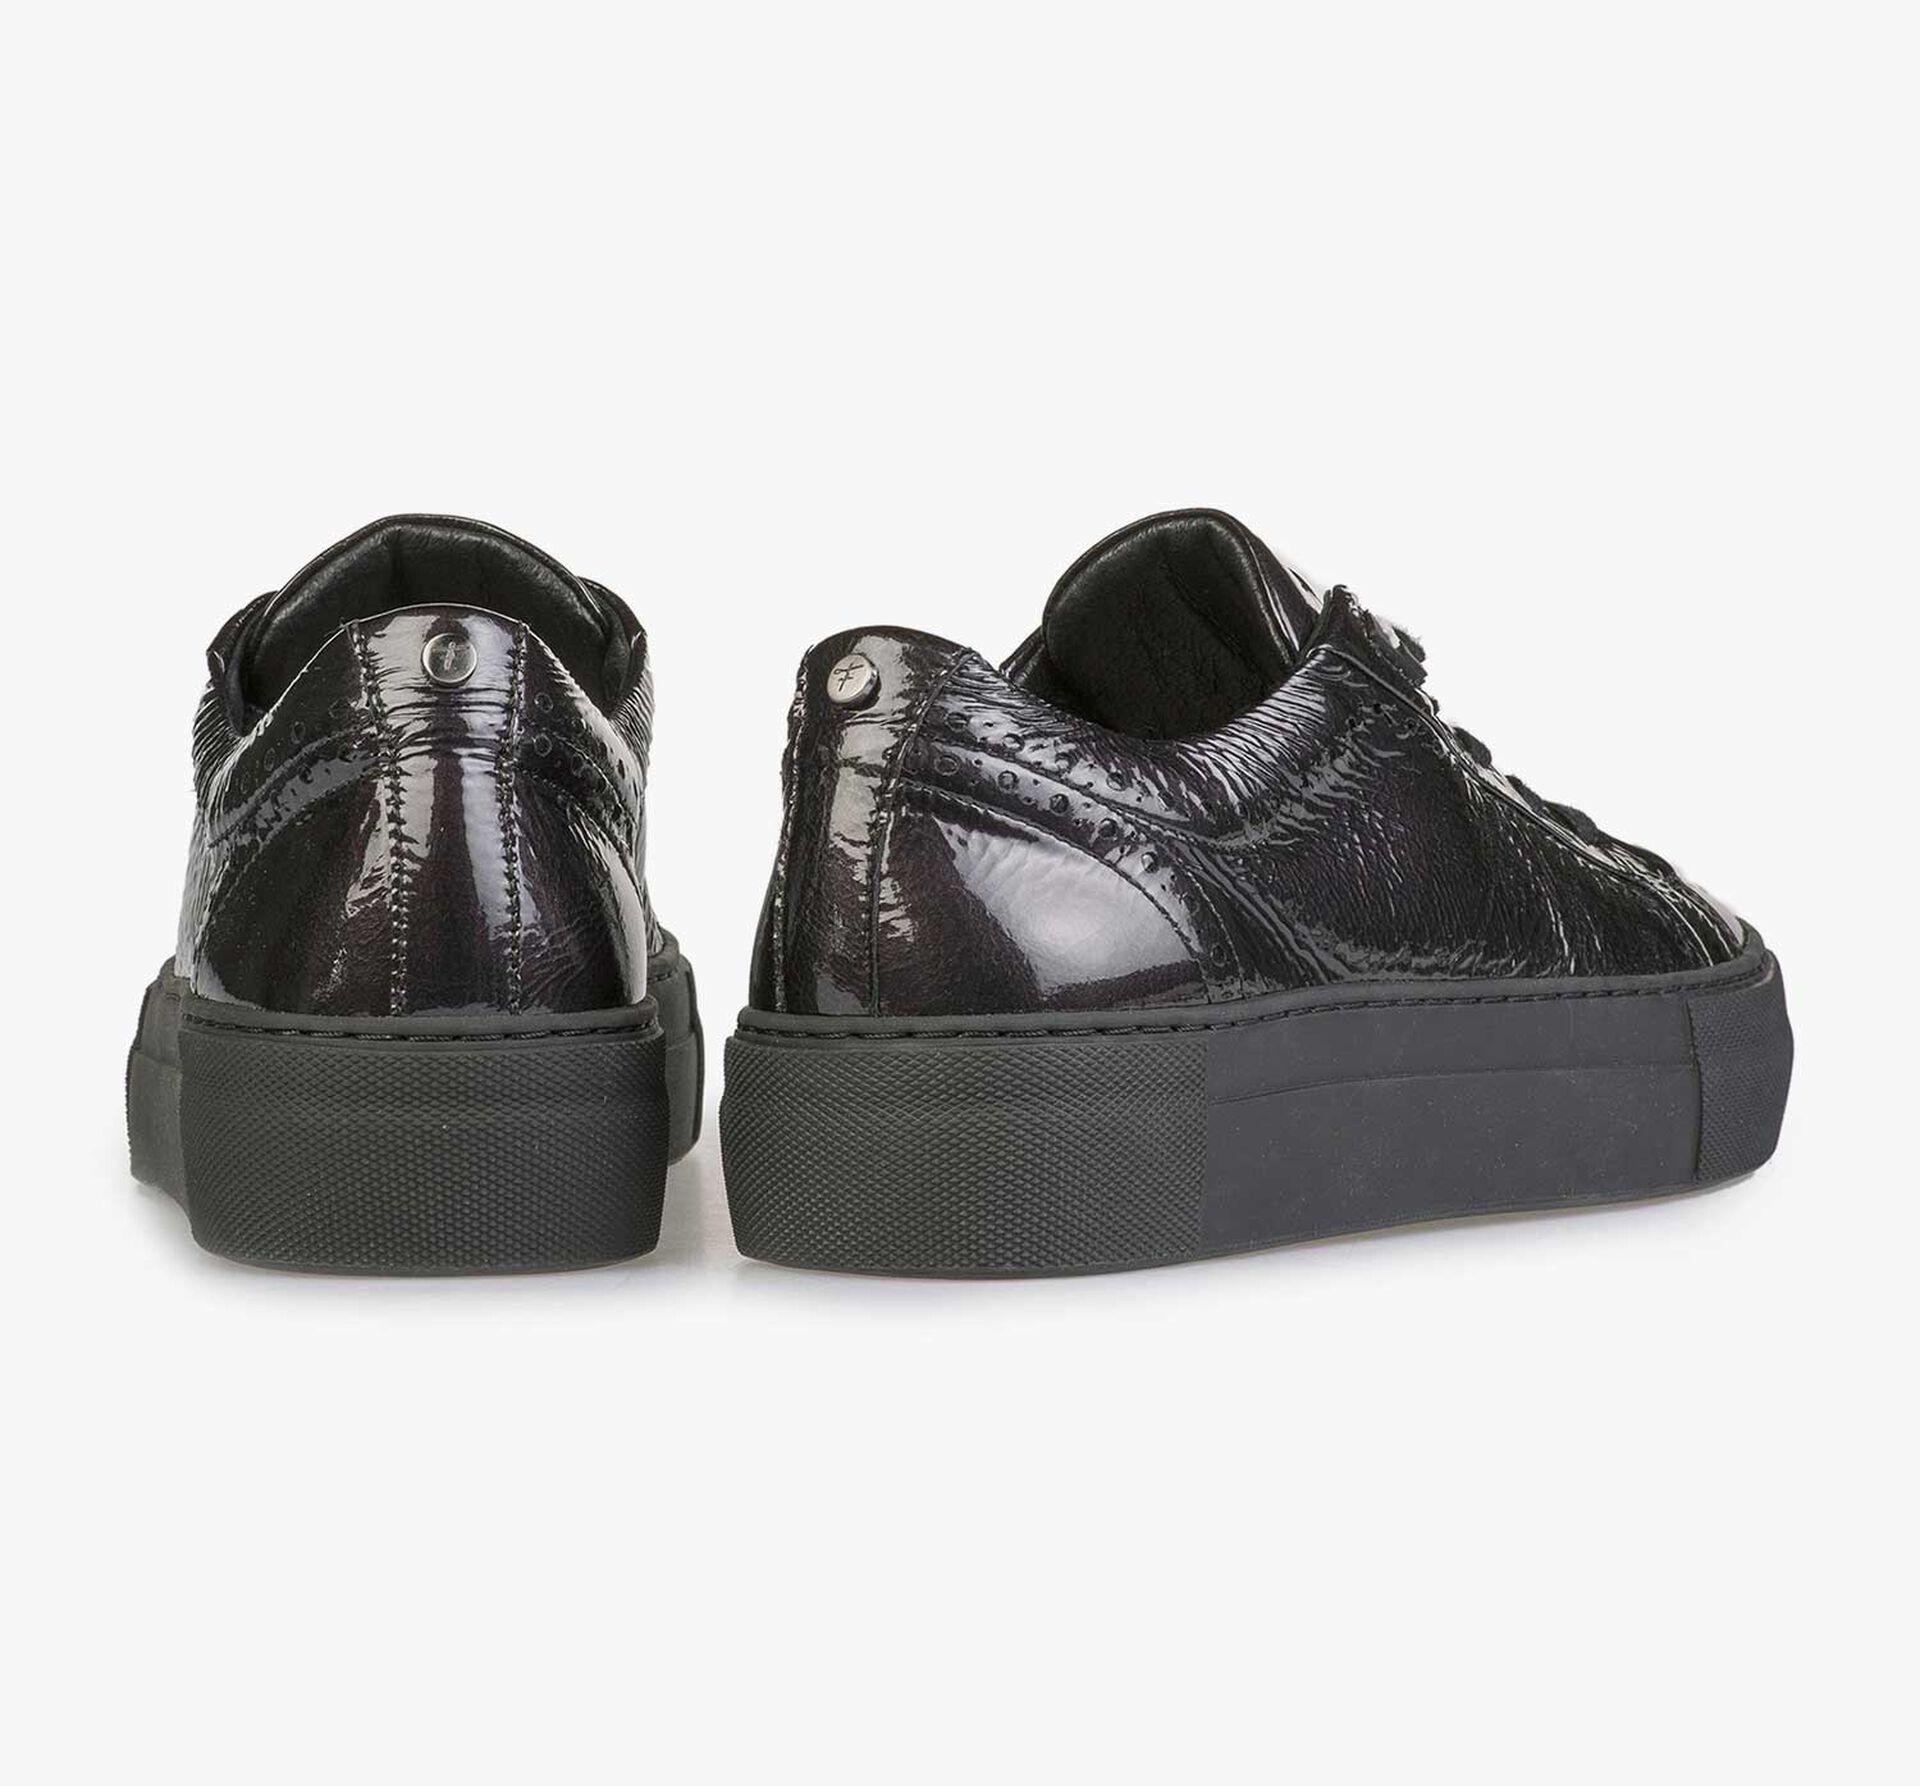 Schwarzer Lackleder-Sneaker mit Knittereffekt